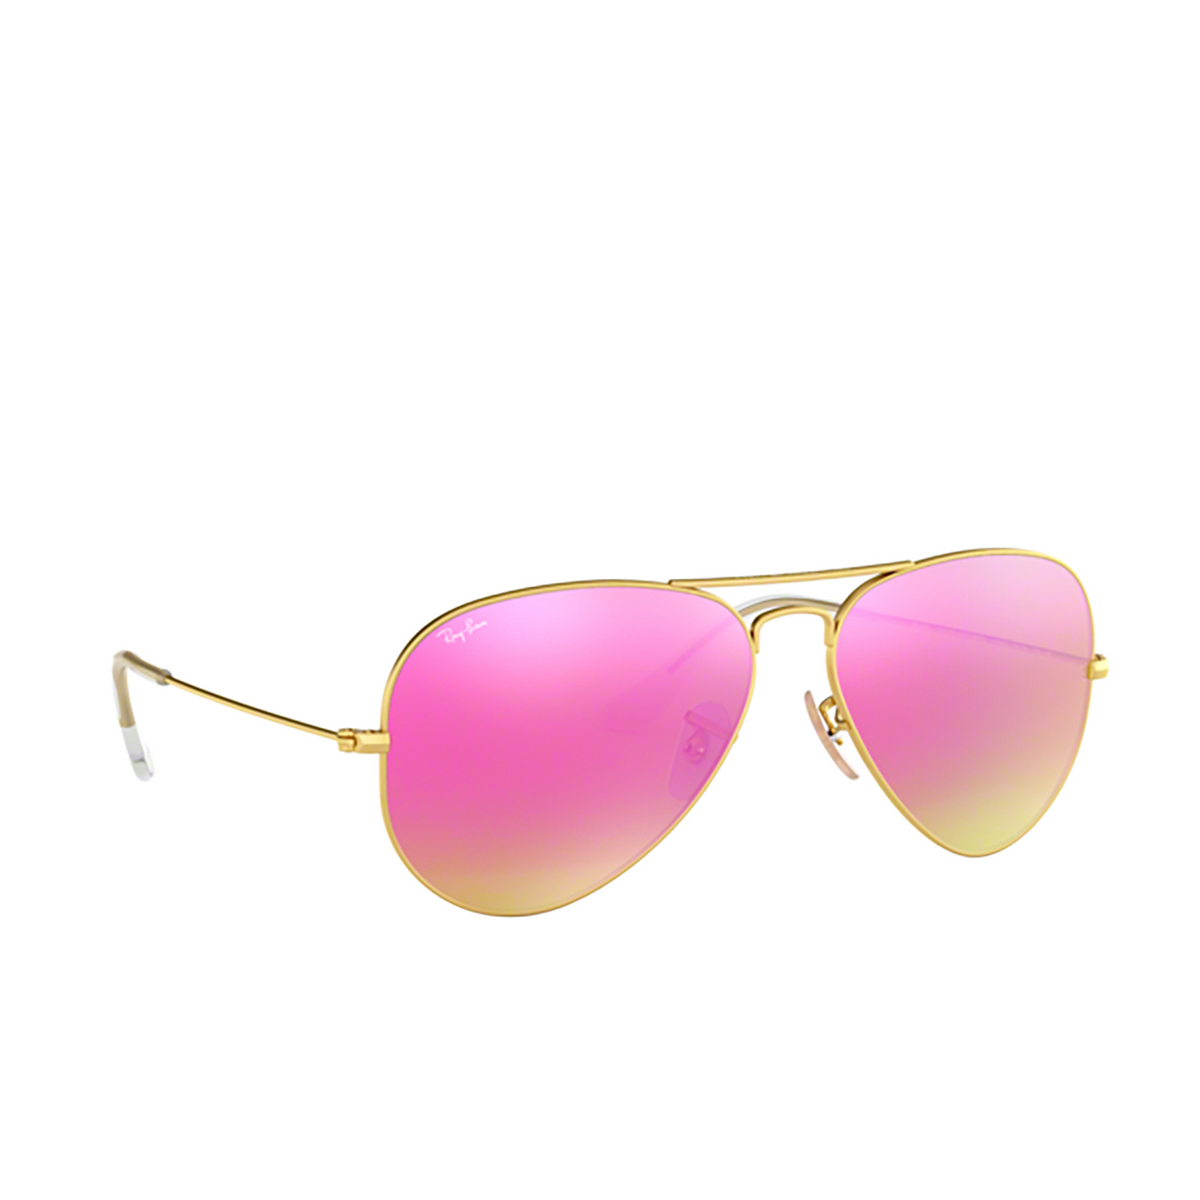 Ray-Ban® Aviator Sunglasses: Aviator Large Metal RB3025 color Matte Arista 112/4T - three-quarters view.